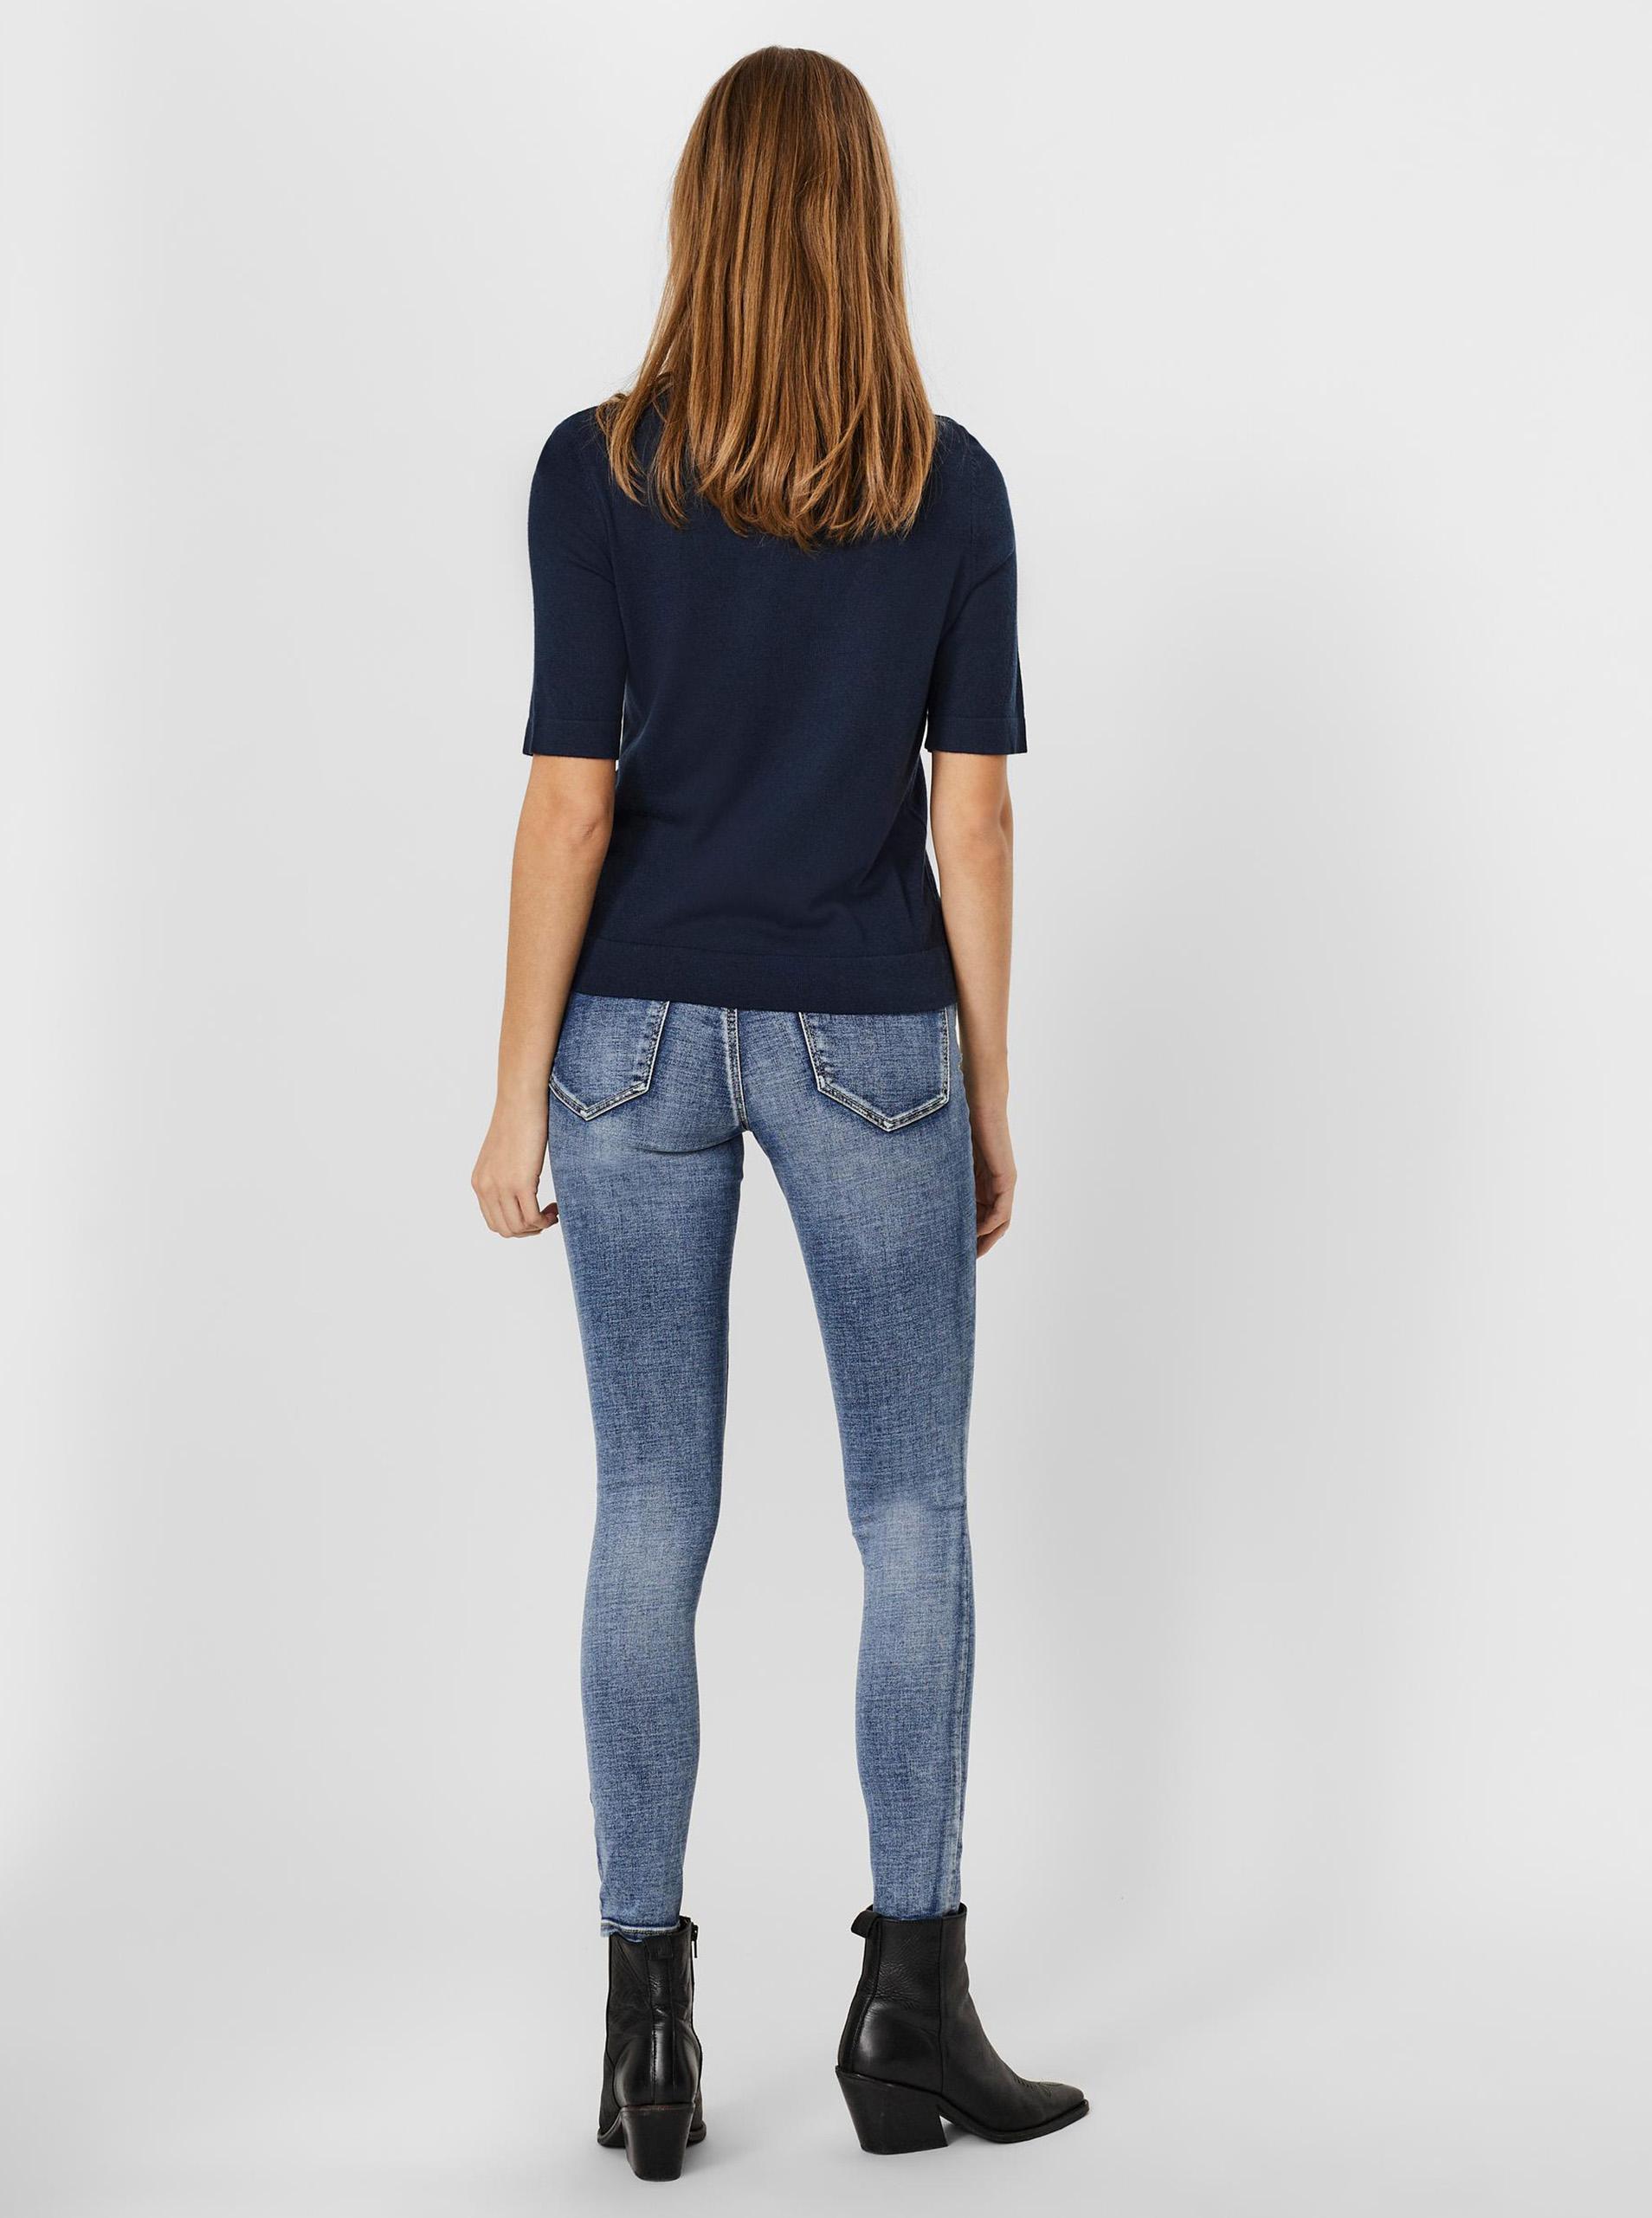 Vero Moda blue T-shirt Silke